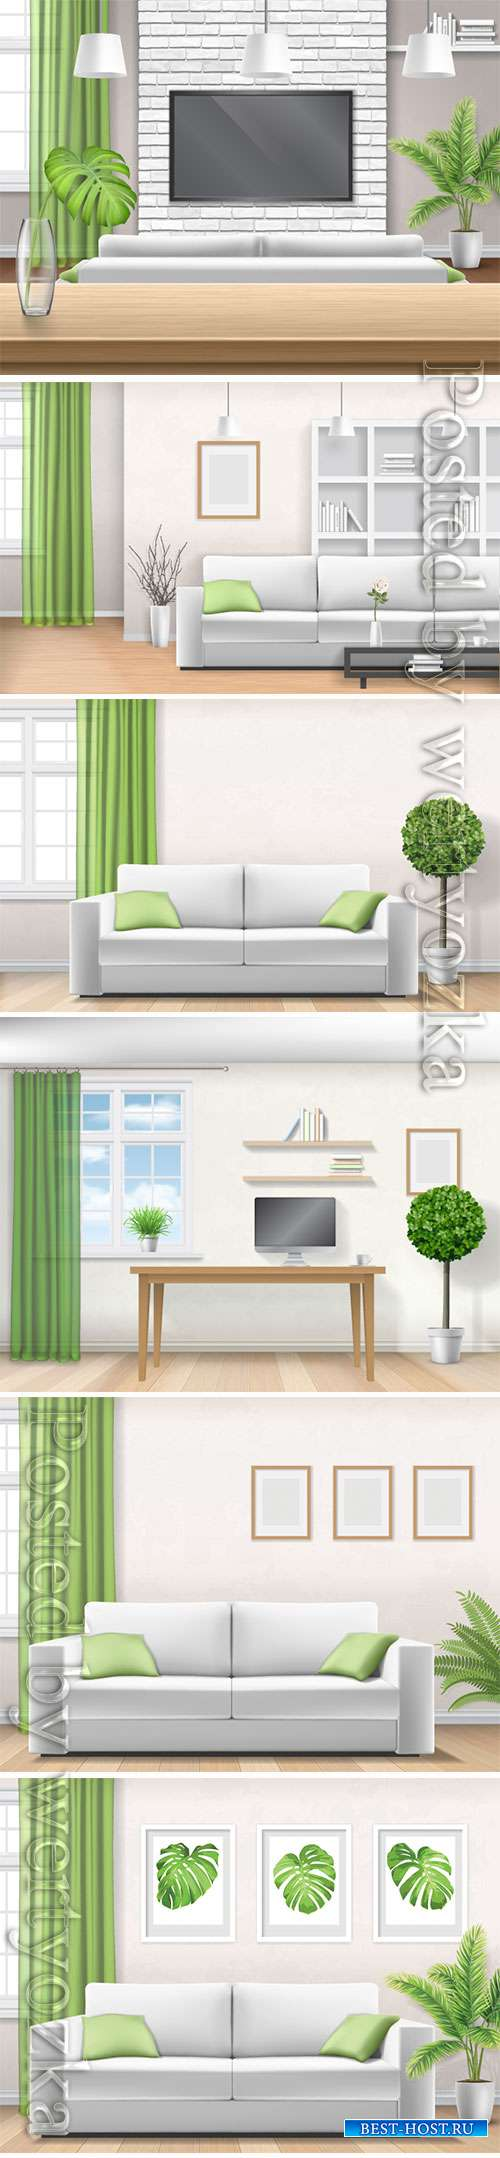 Realistic home interior vector template # 5